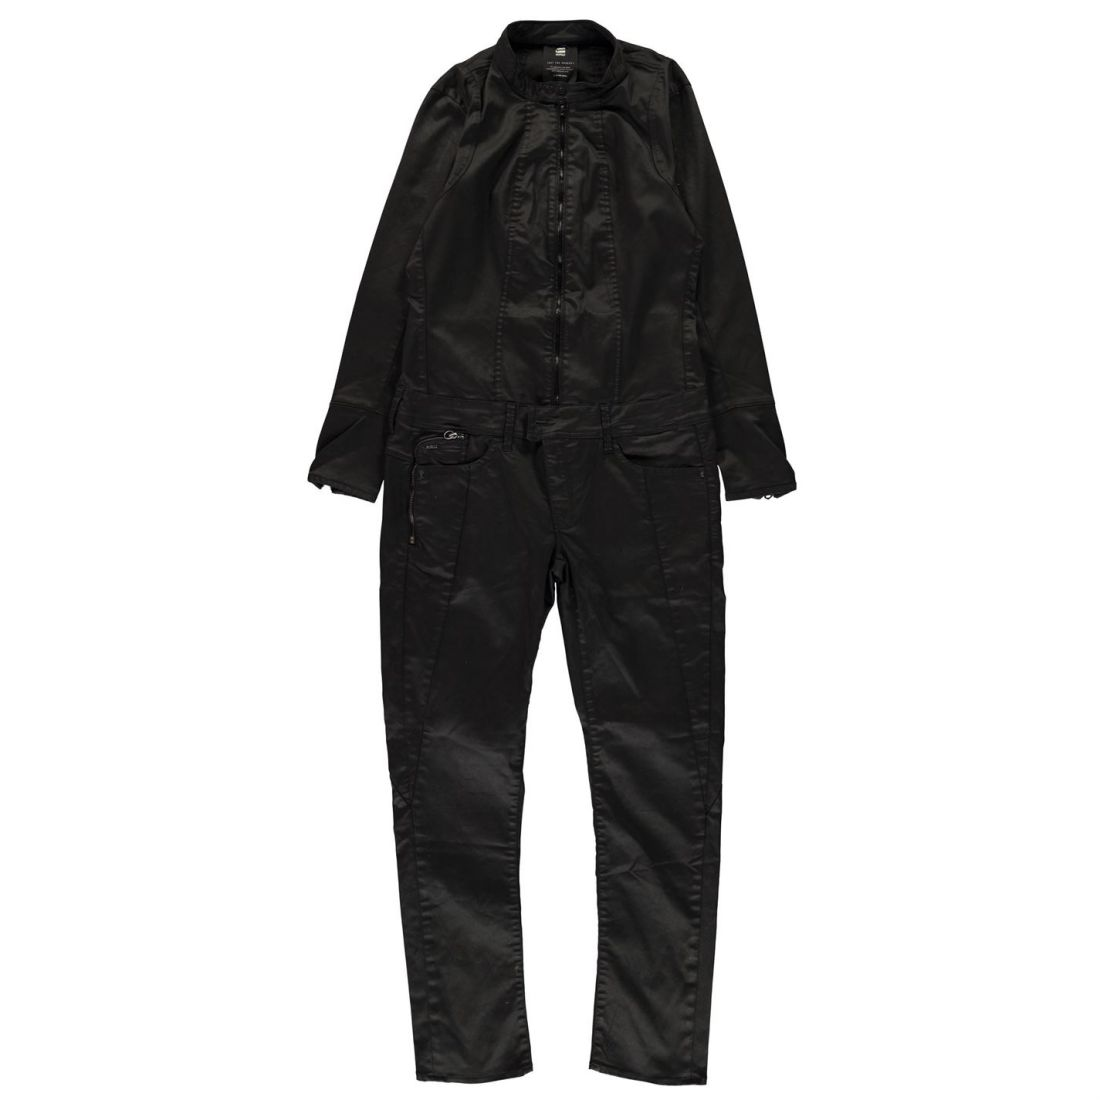 6c85a5767d8 G Star Womens Lynn Jet Jumpsuit Long Sleeve Zip Tonal Stitching ...